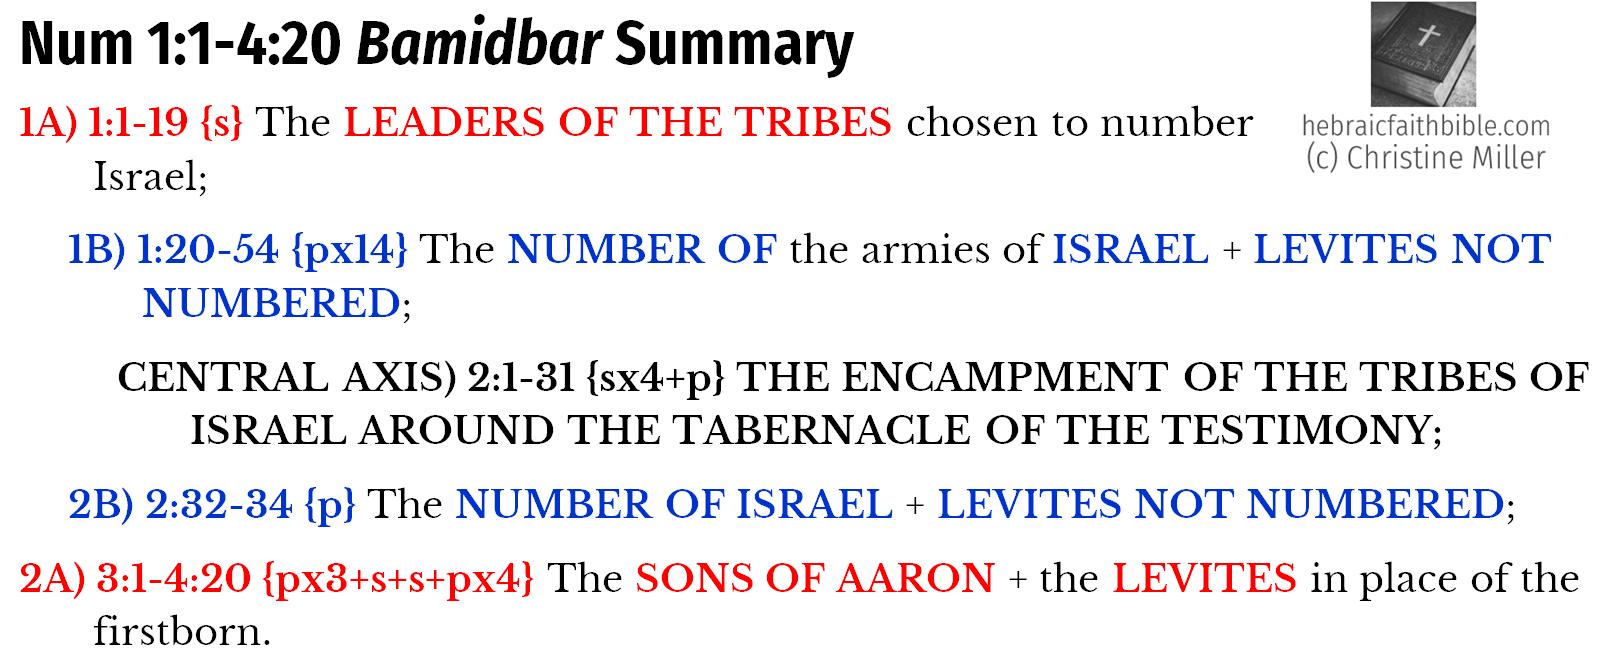 Num 1:1-4:20 Bamidbar Summary chiasm | hebraicfaithbible.com